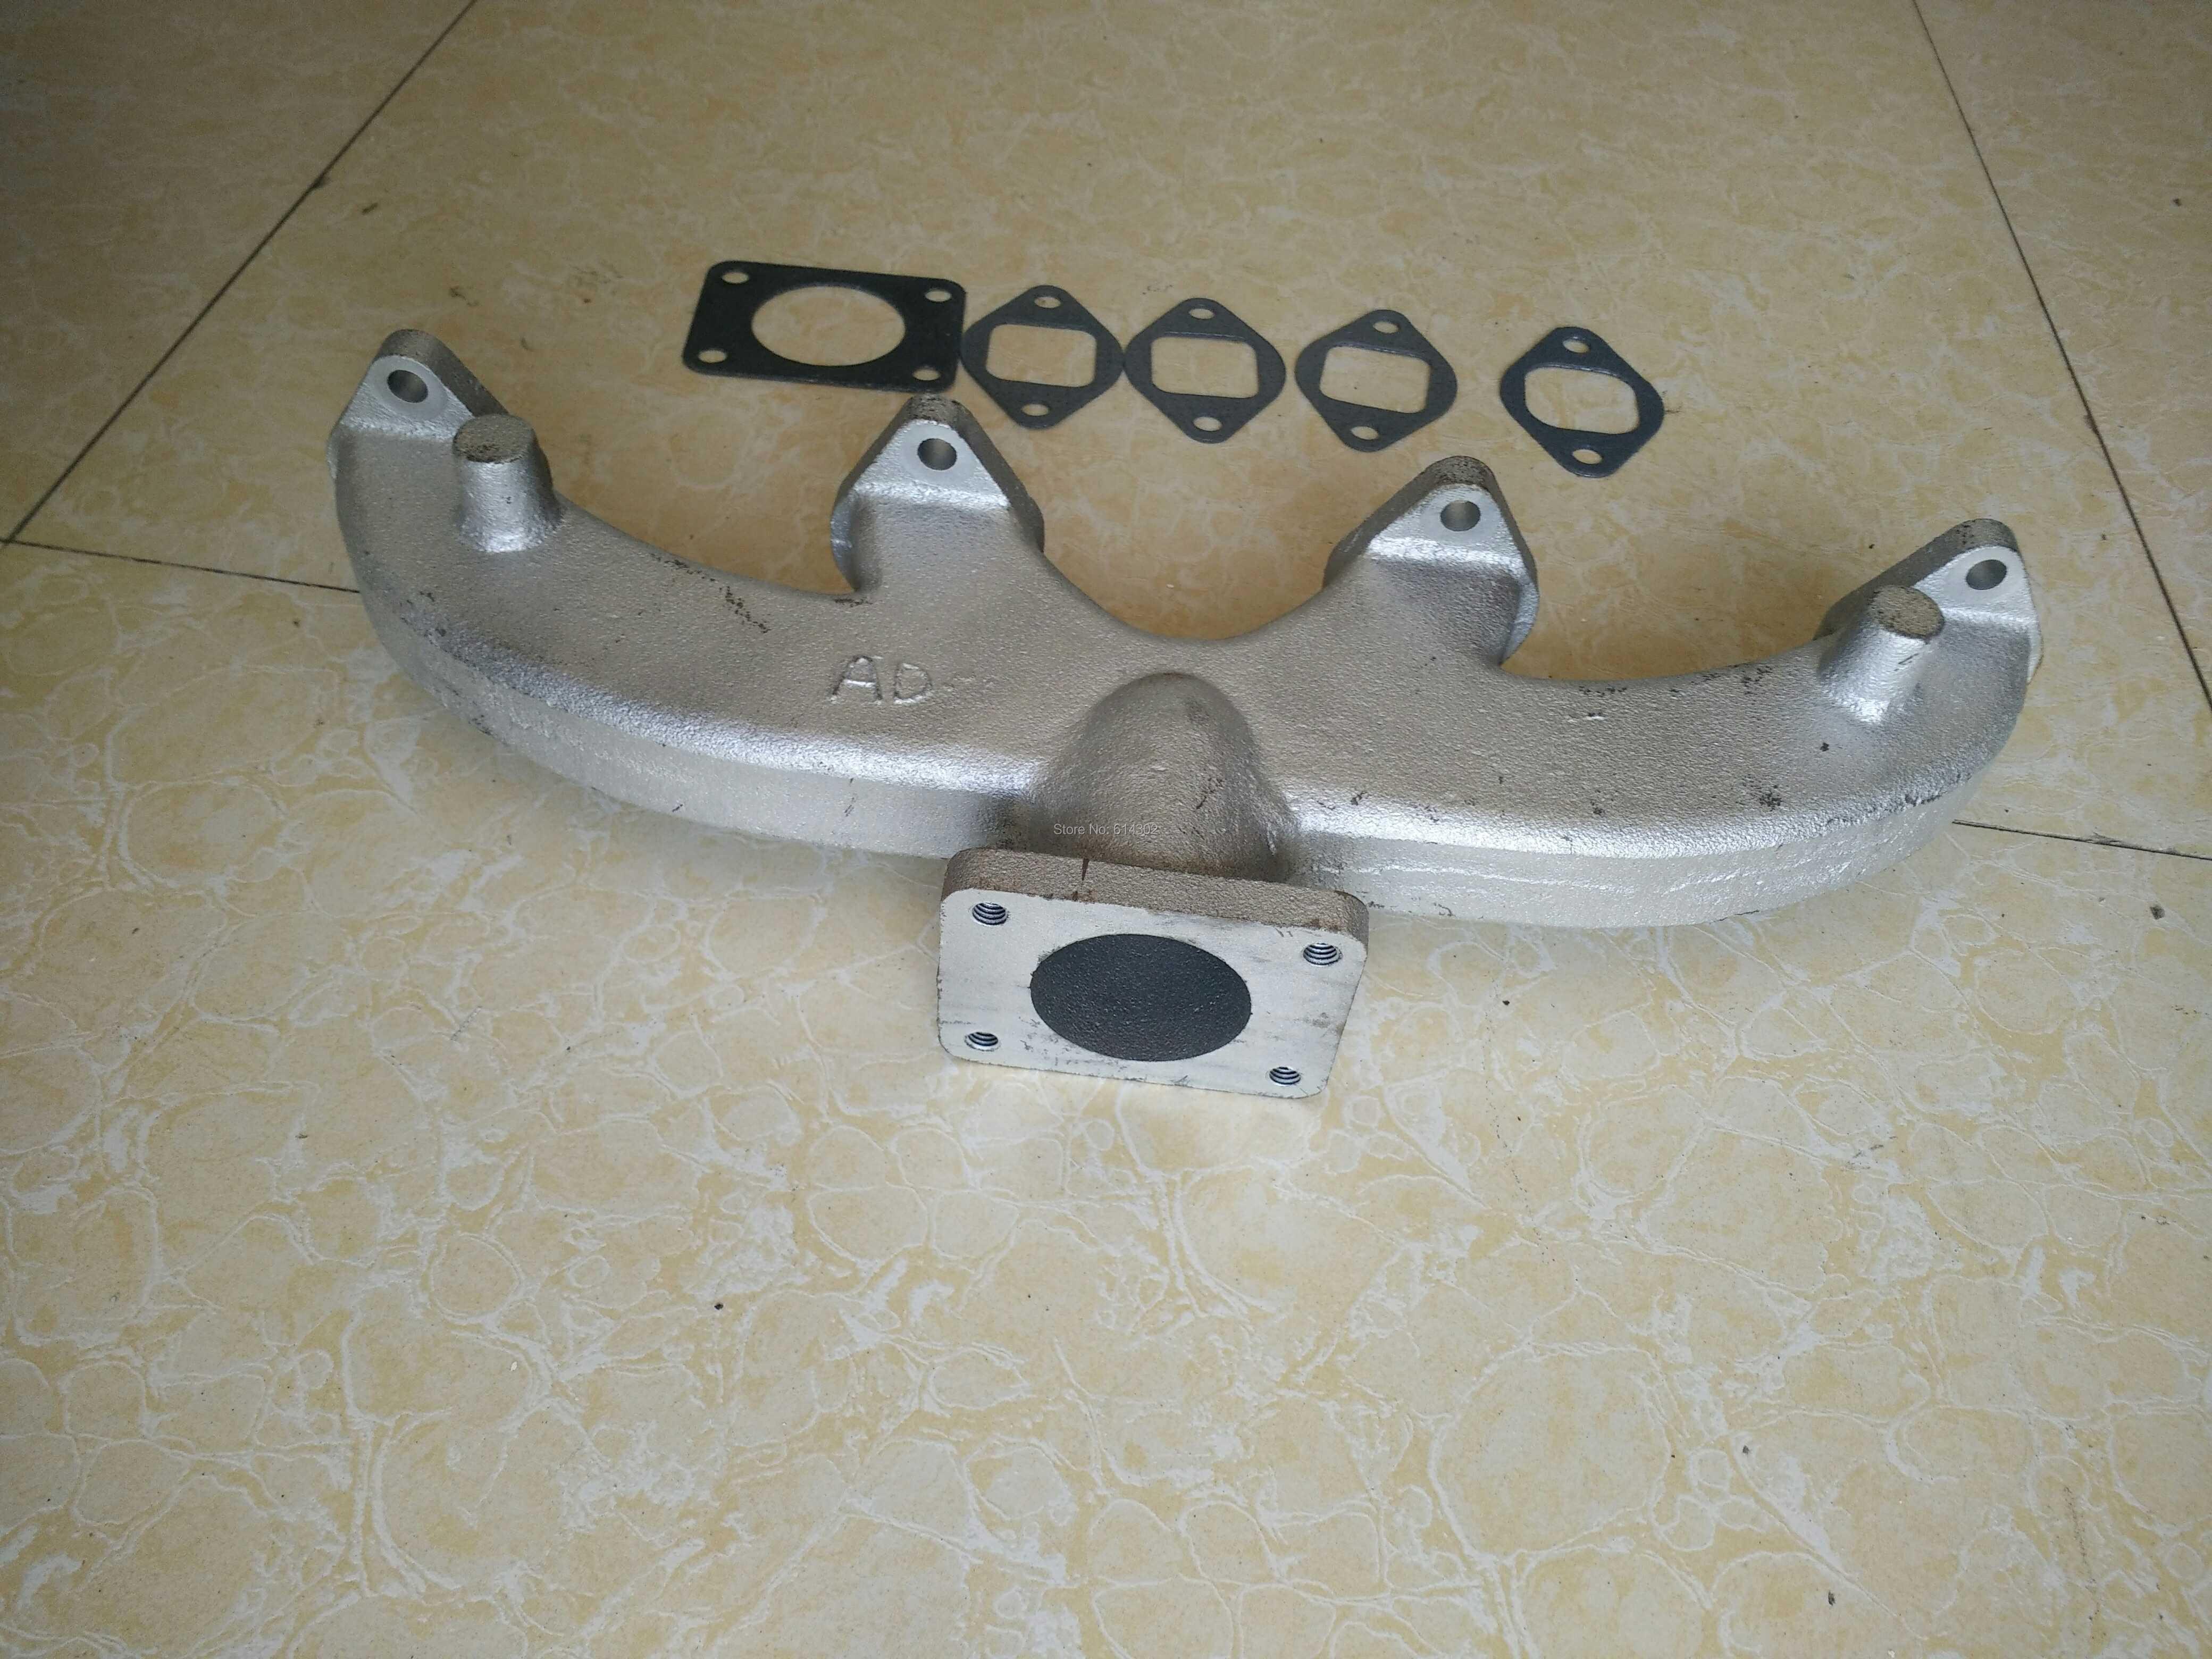 China supplier original Exhaust manifold for 495D K4100D  K4102D  diesel engine spare parts